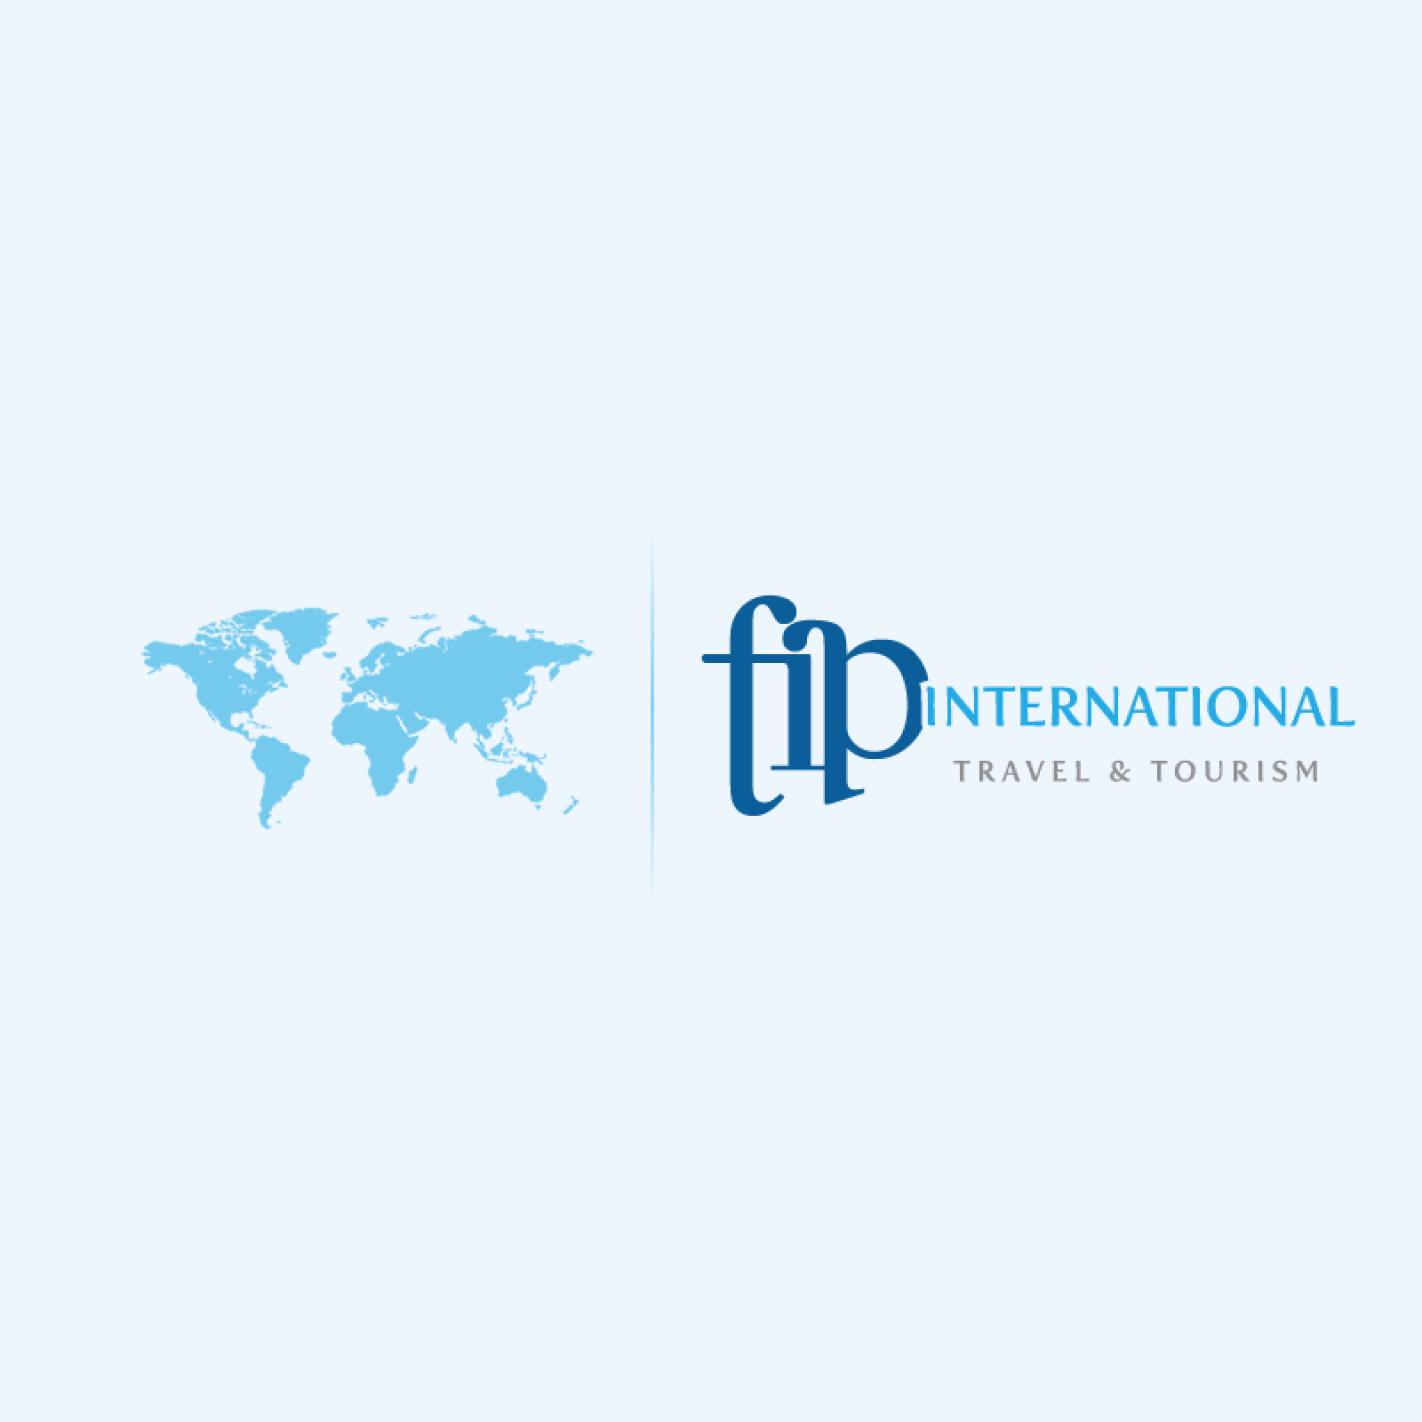 fip-international-logo-erbil-design-suncode